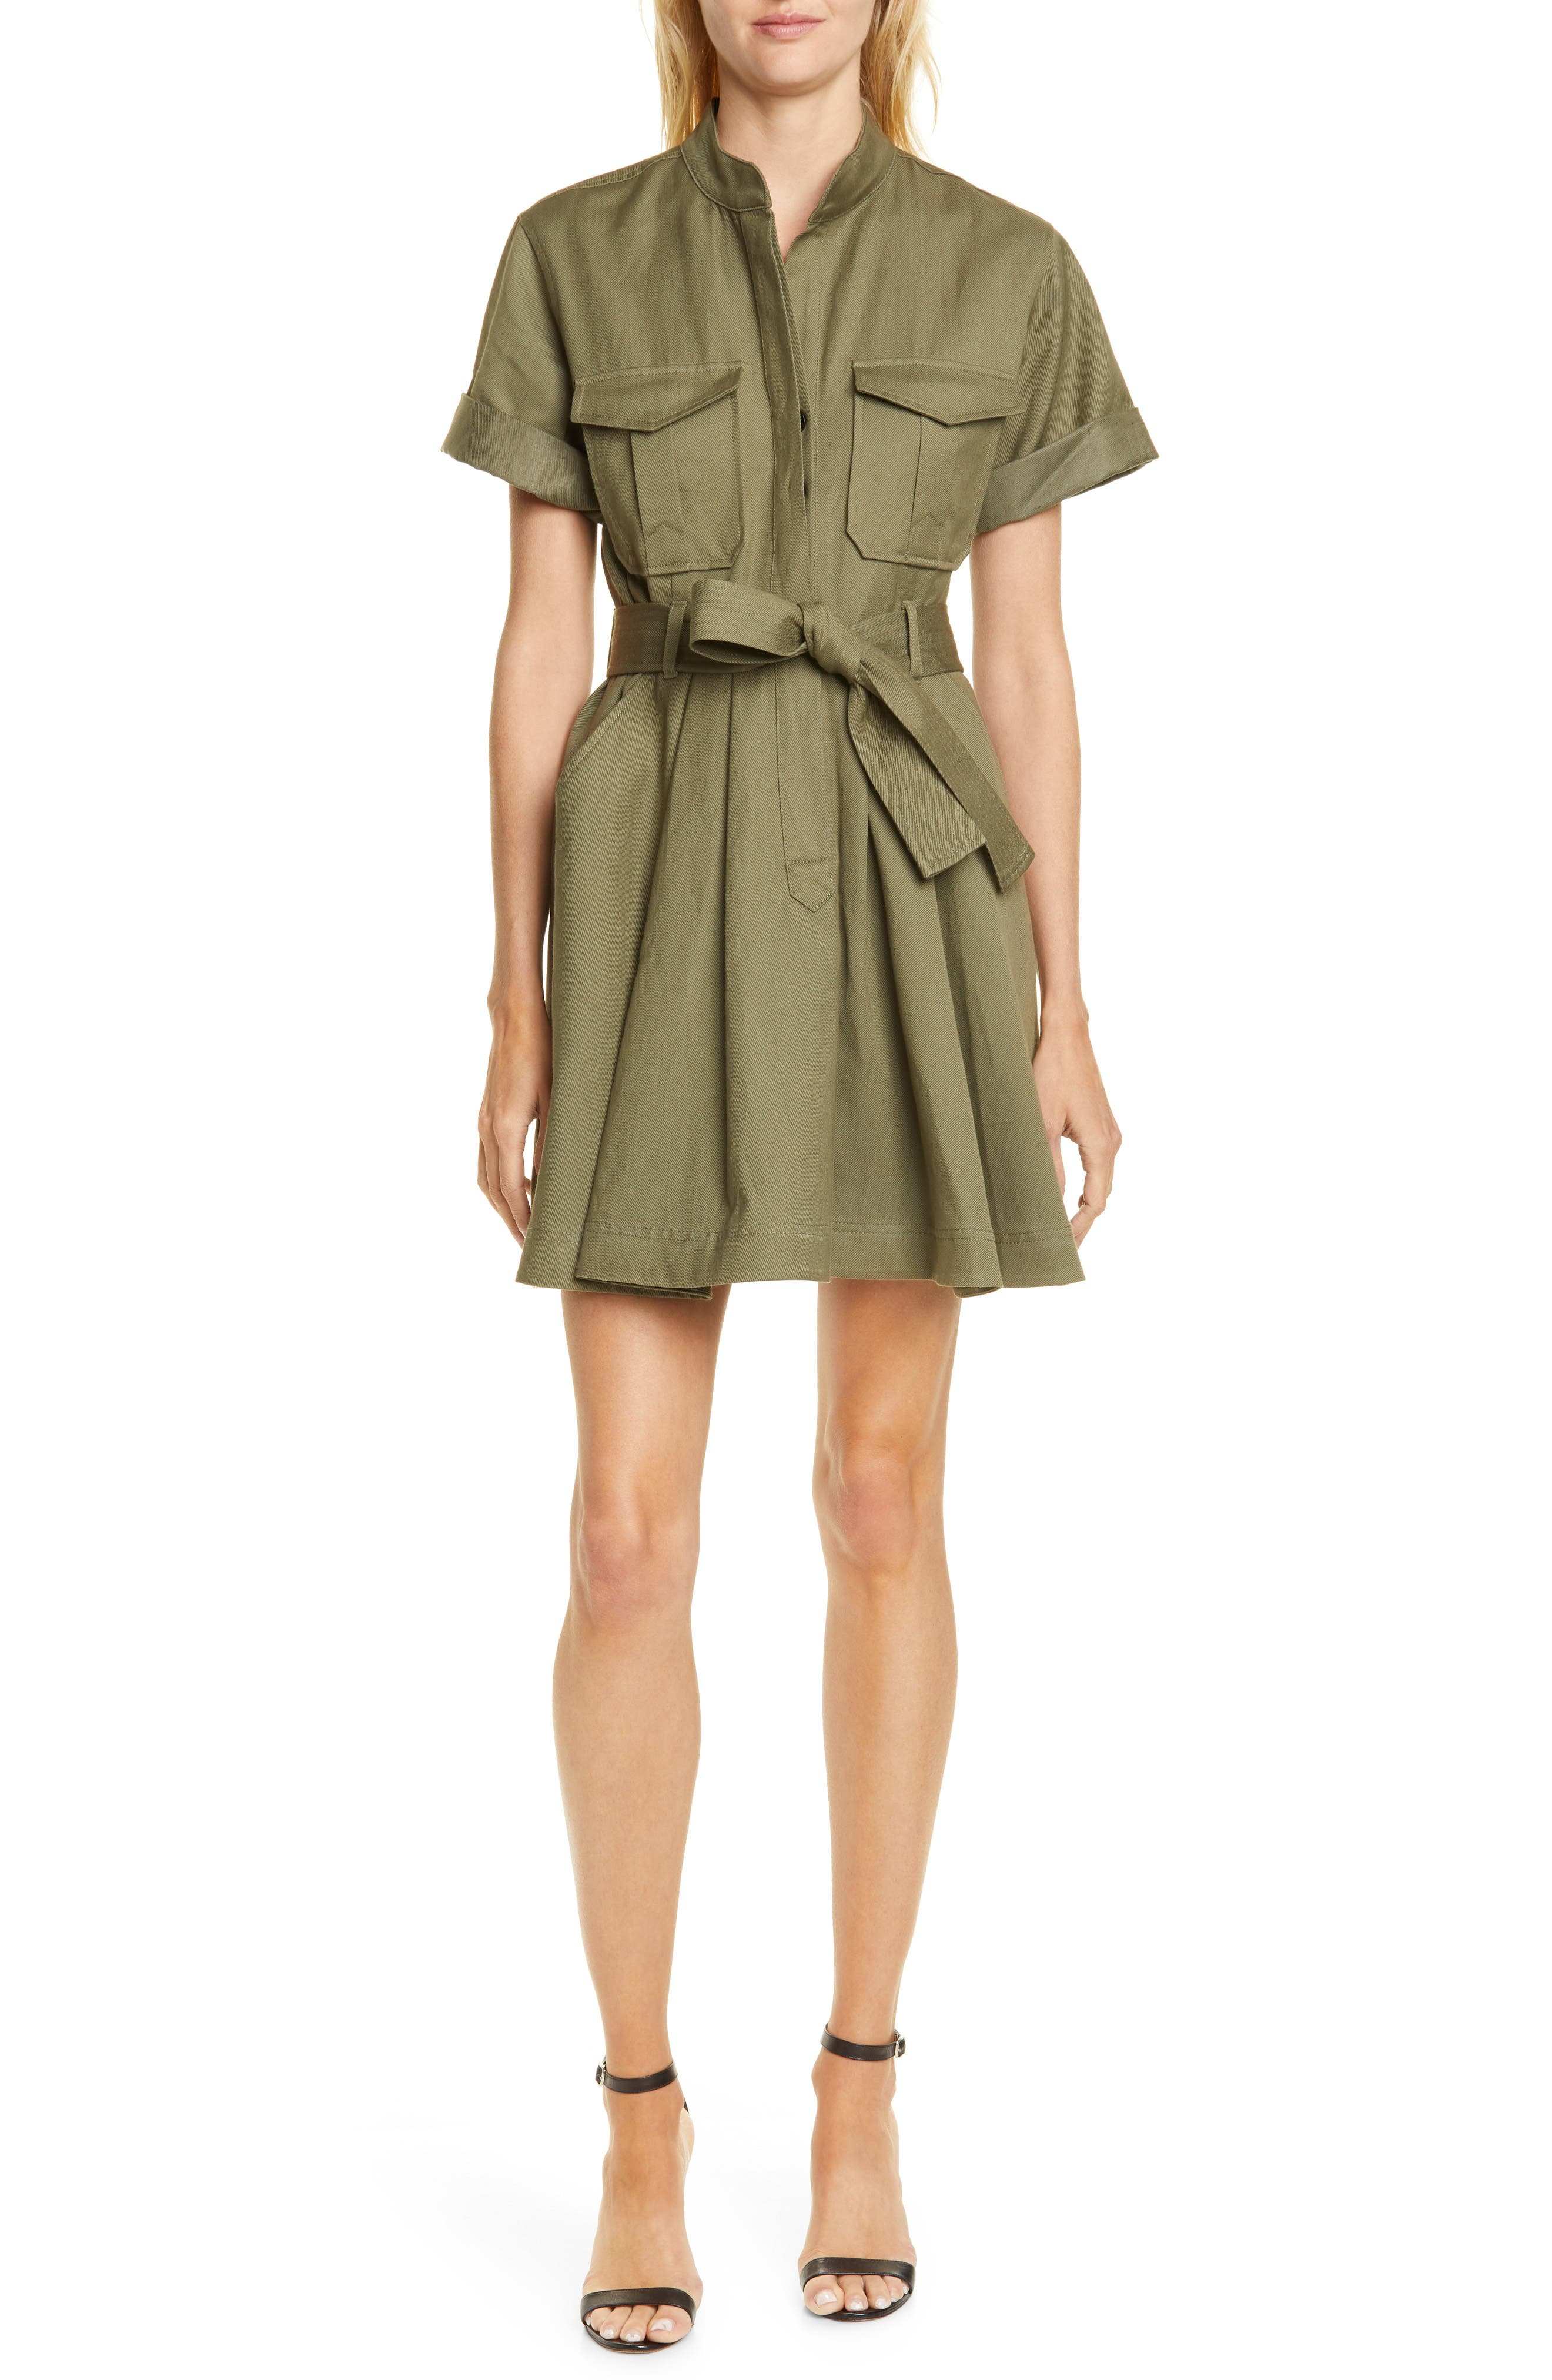 A.l.c. Bryn Belted A-Line Dress, Green